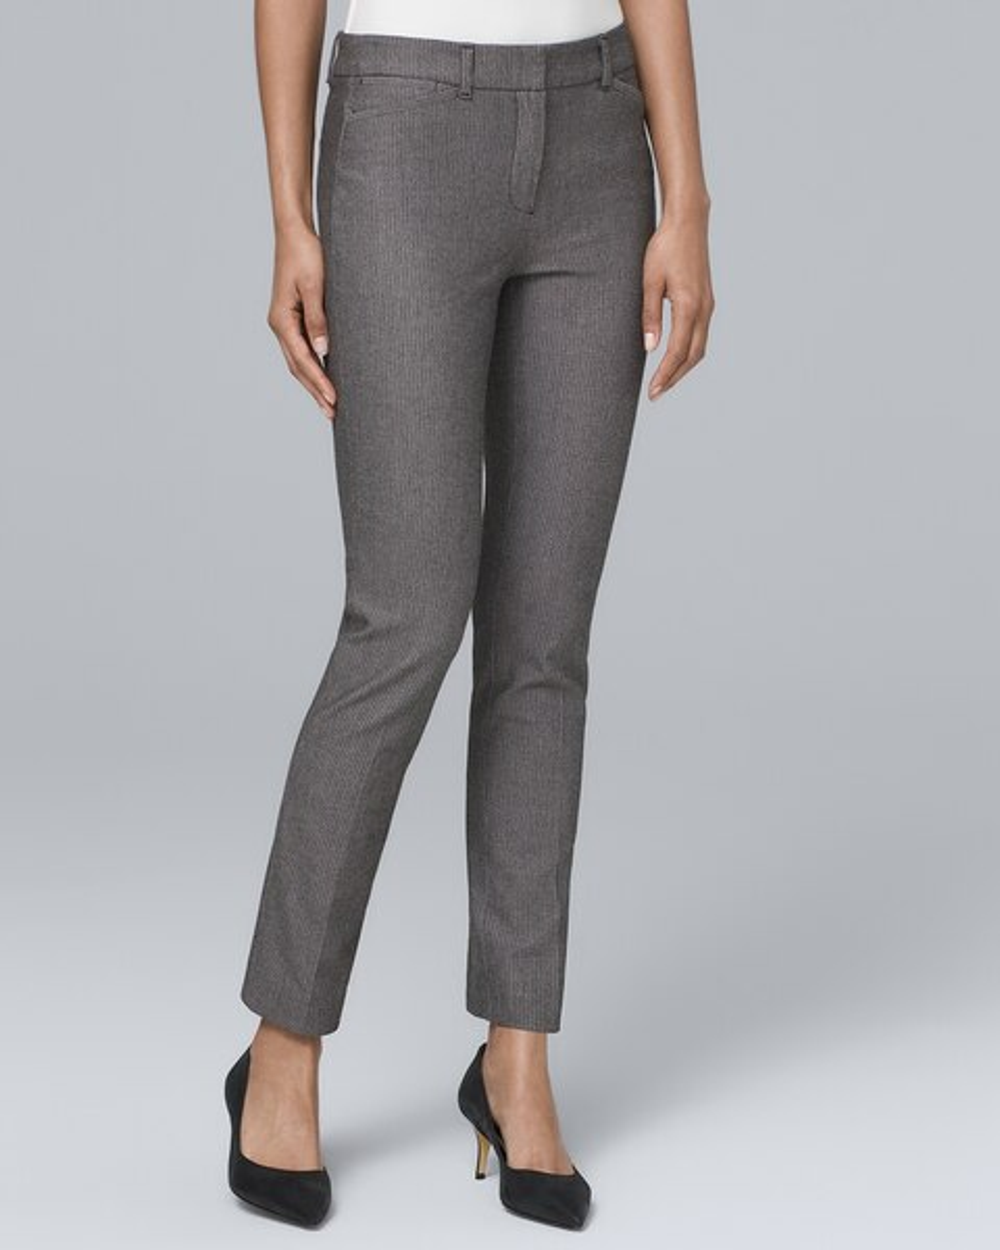 dea89408ab36 Modern Fit Comfort Stretch Slim Ankle Pants - White House Black Market